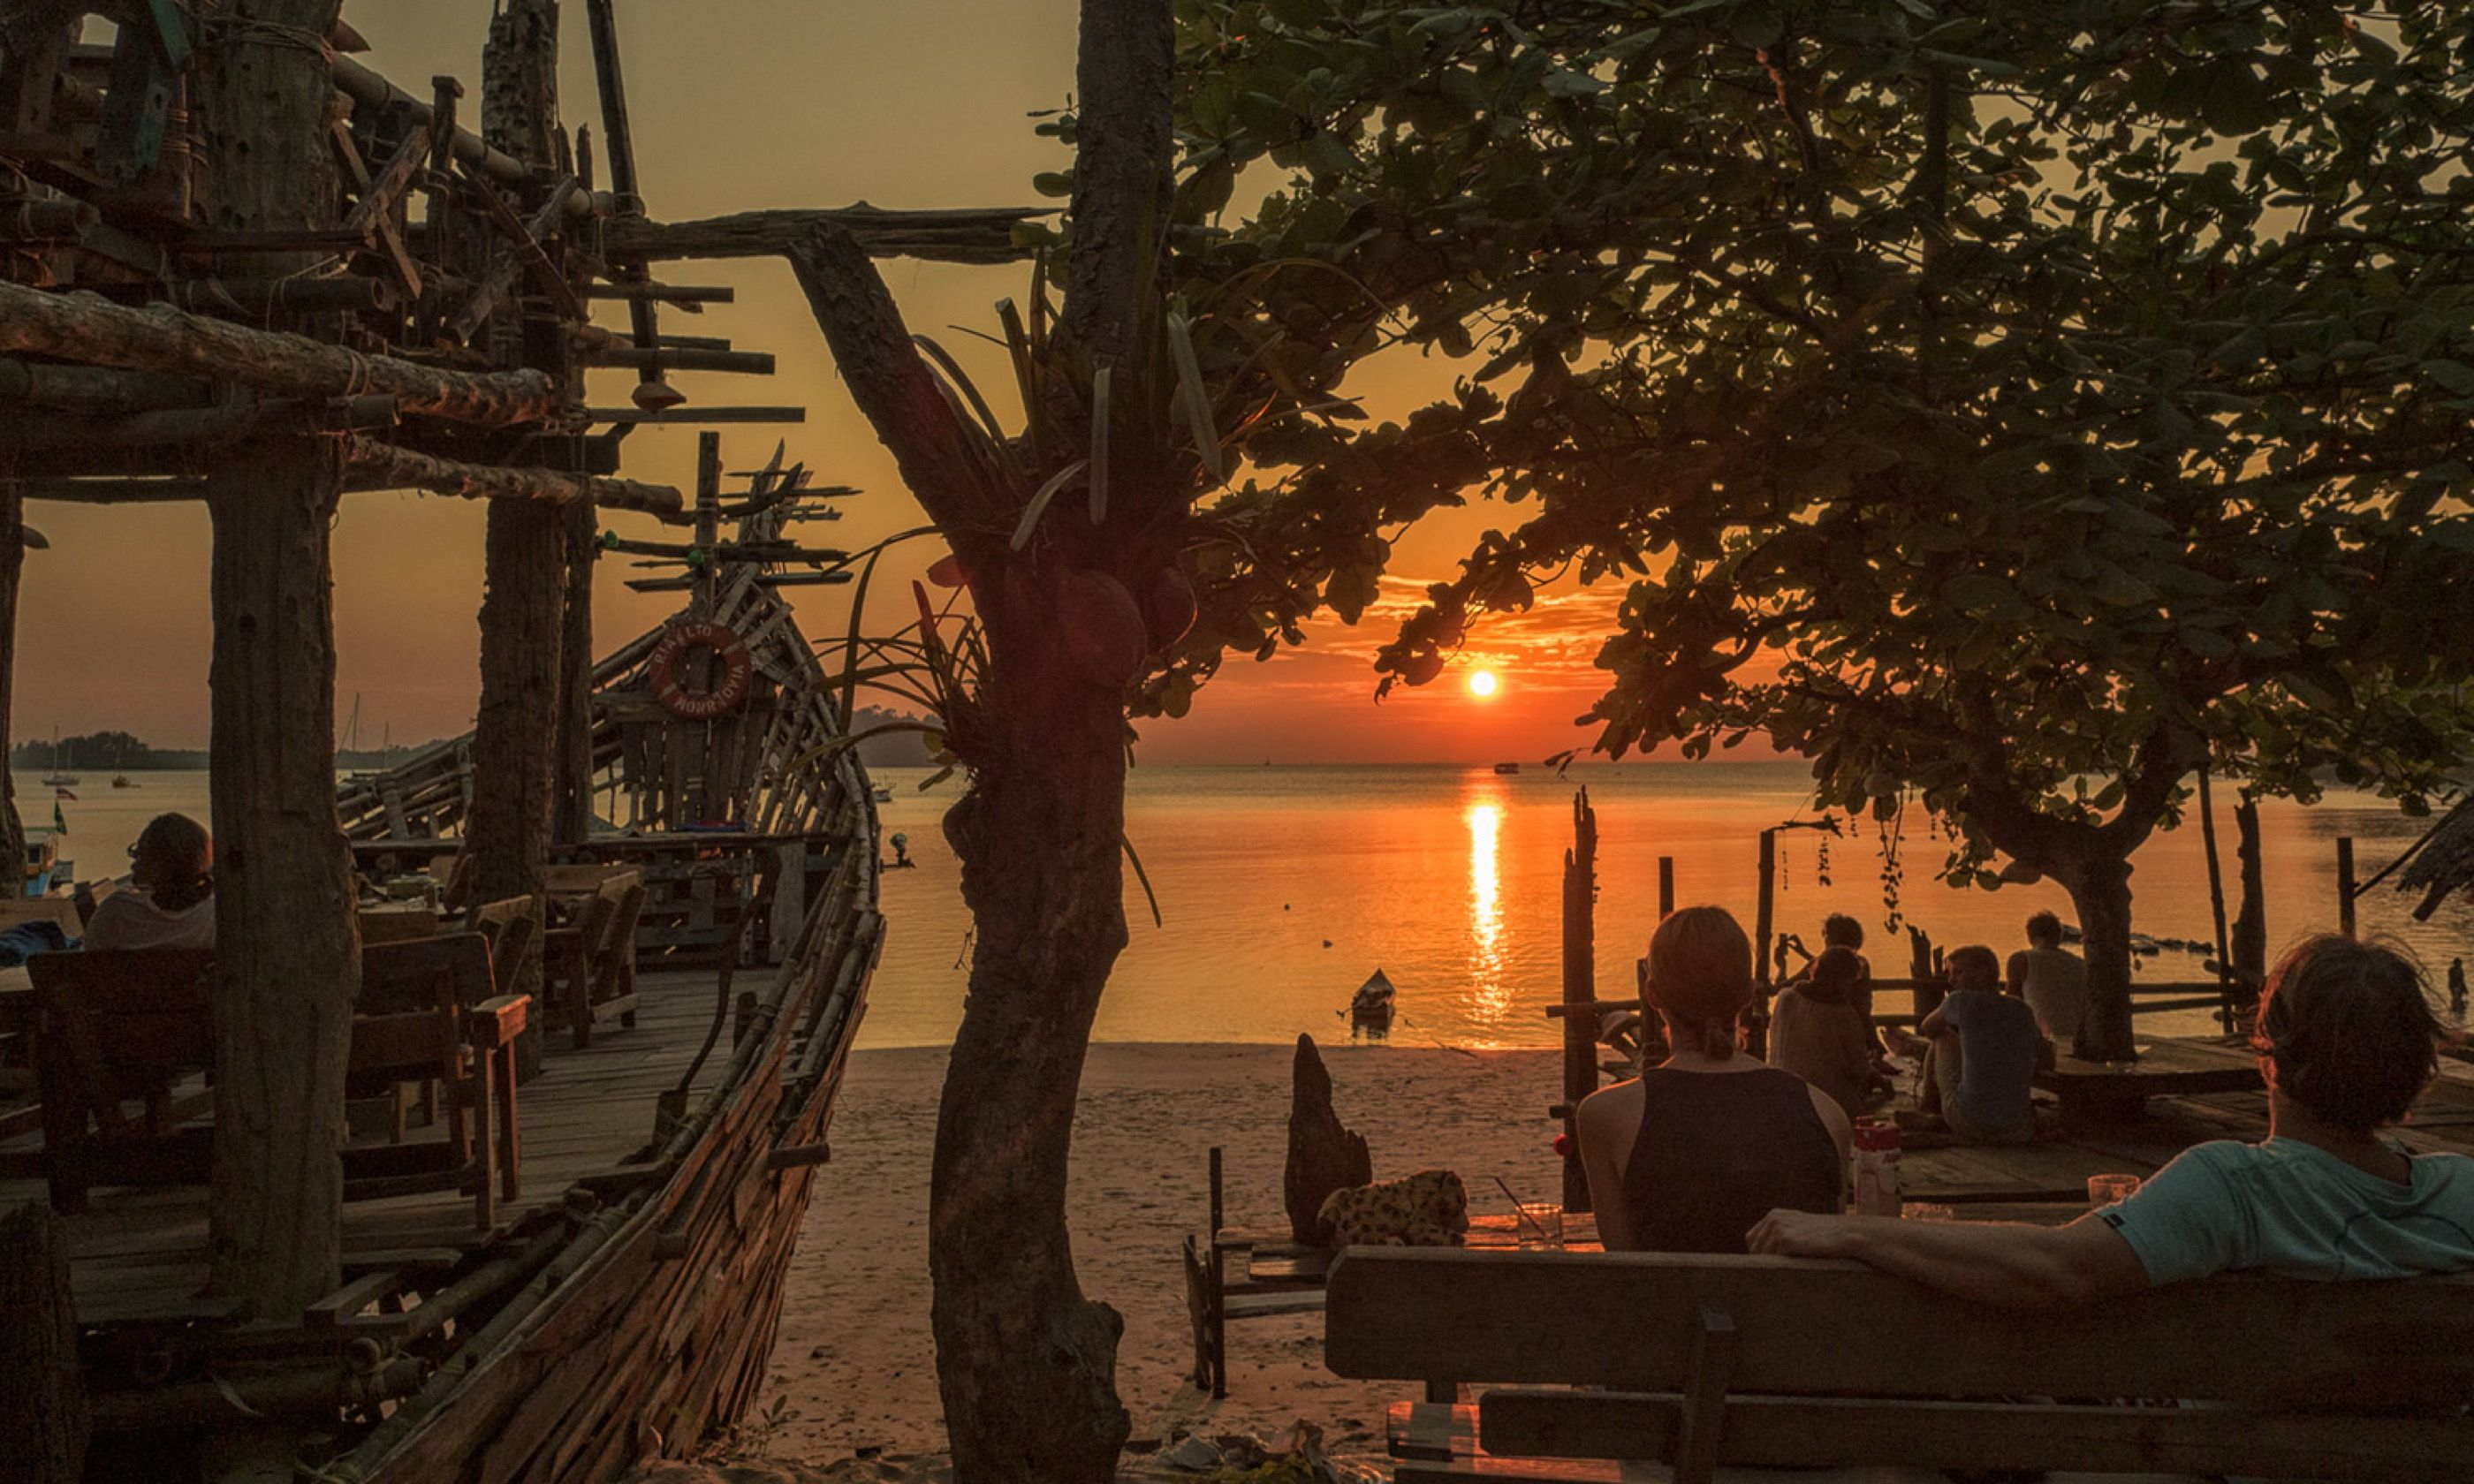 Sunset from the Hippy Bar (Jamie Furlong)